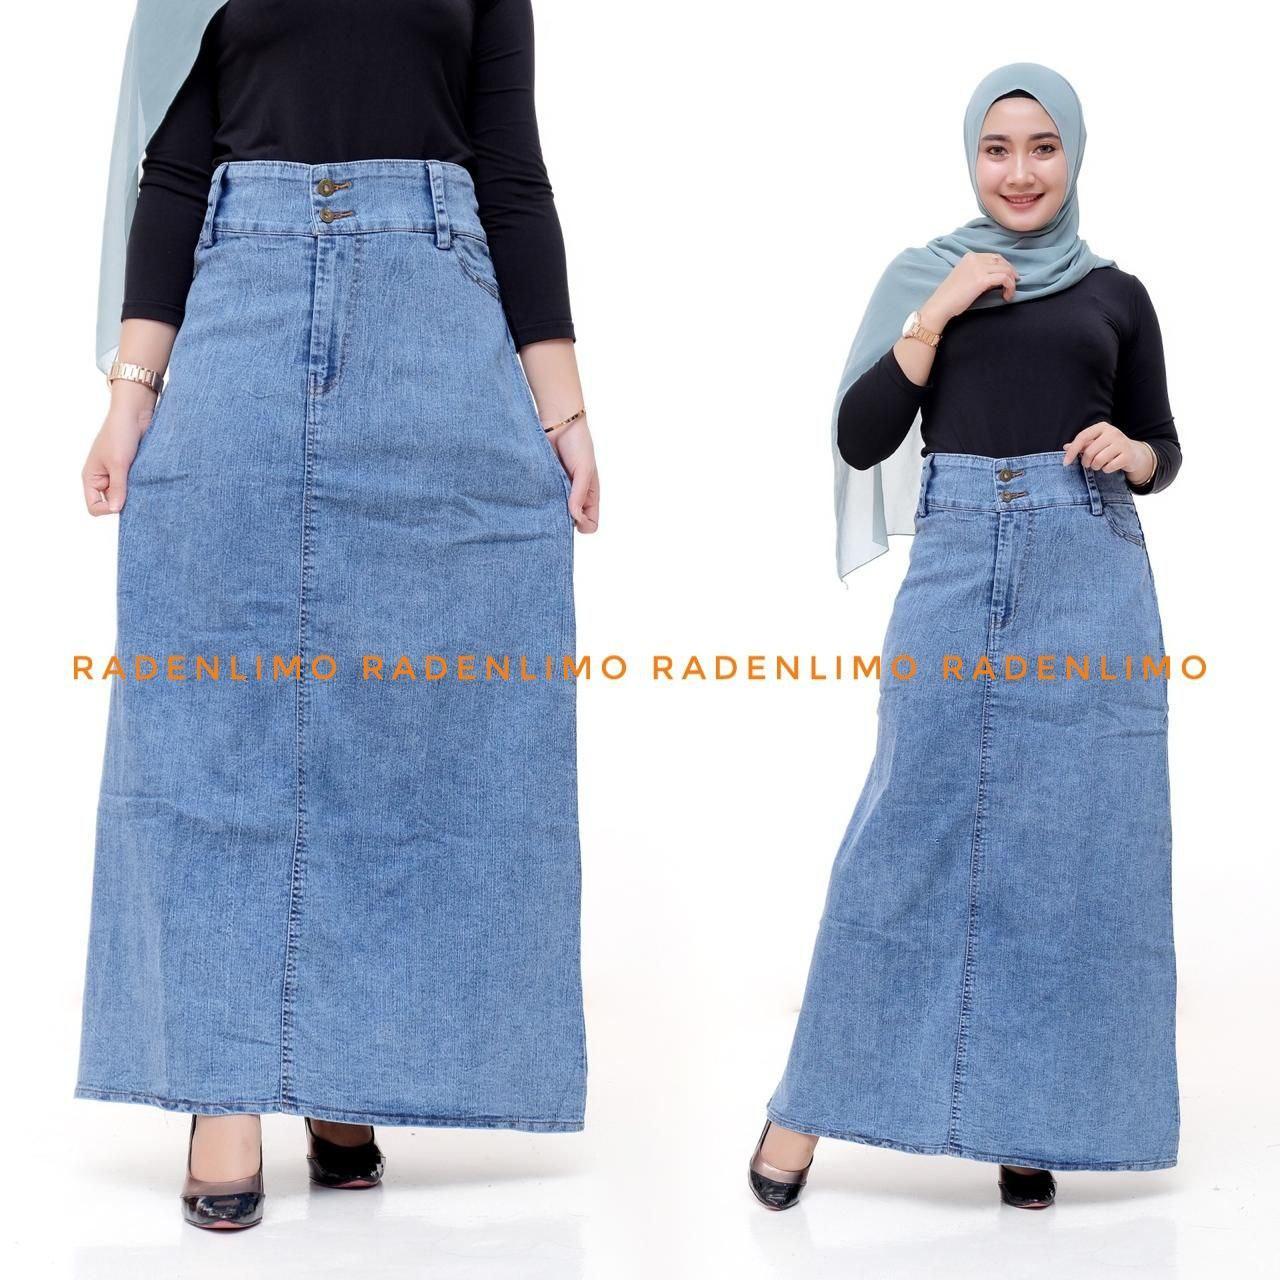 rok model a / rok hitam panjangg model a / a line skirt / rok kerja / rok pelatihan / rok ospek / rok perawat / rok muslimah / rok dinas / fashion wanita